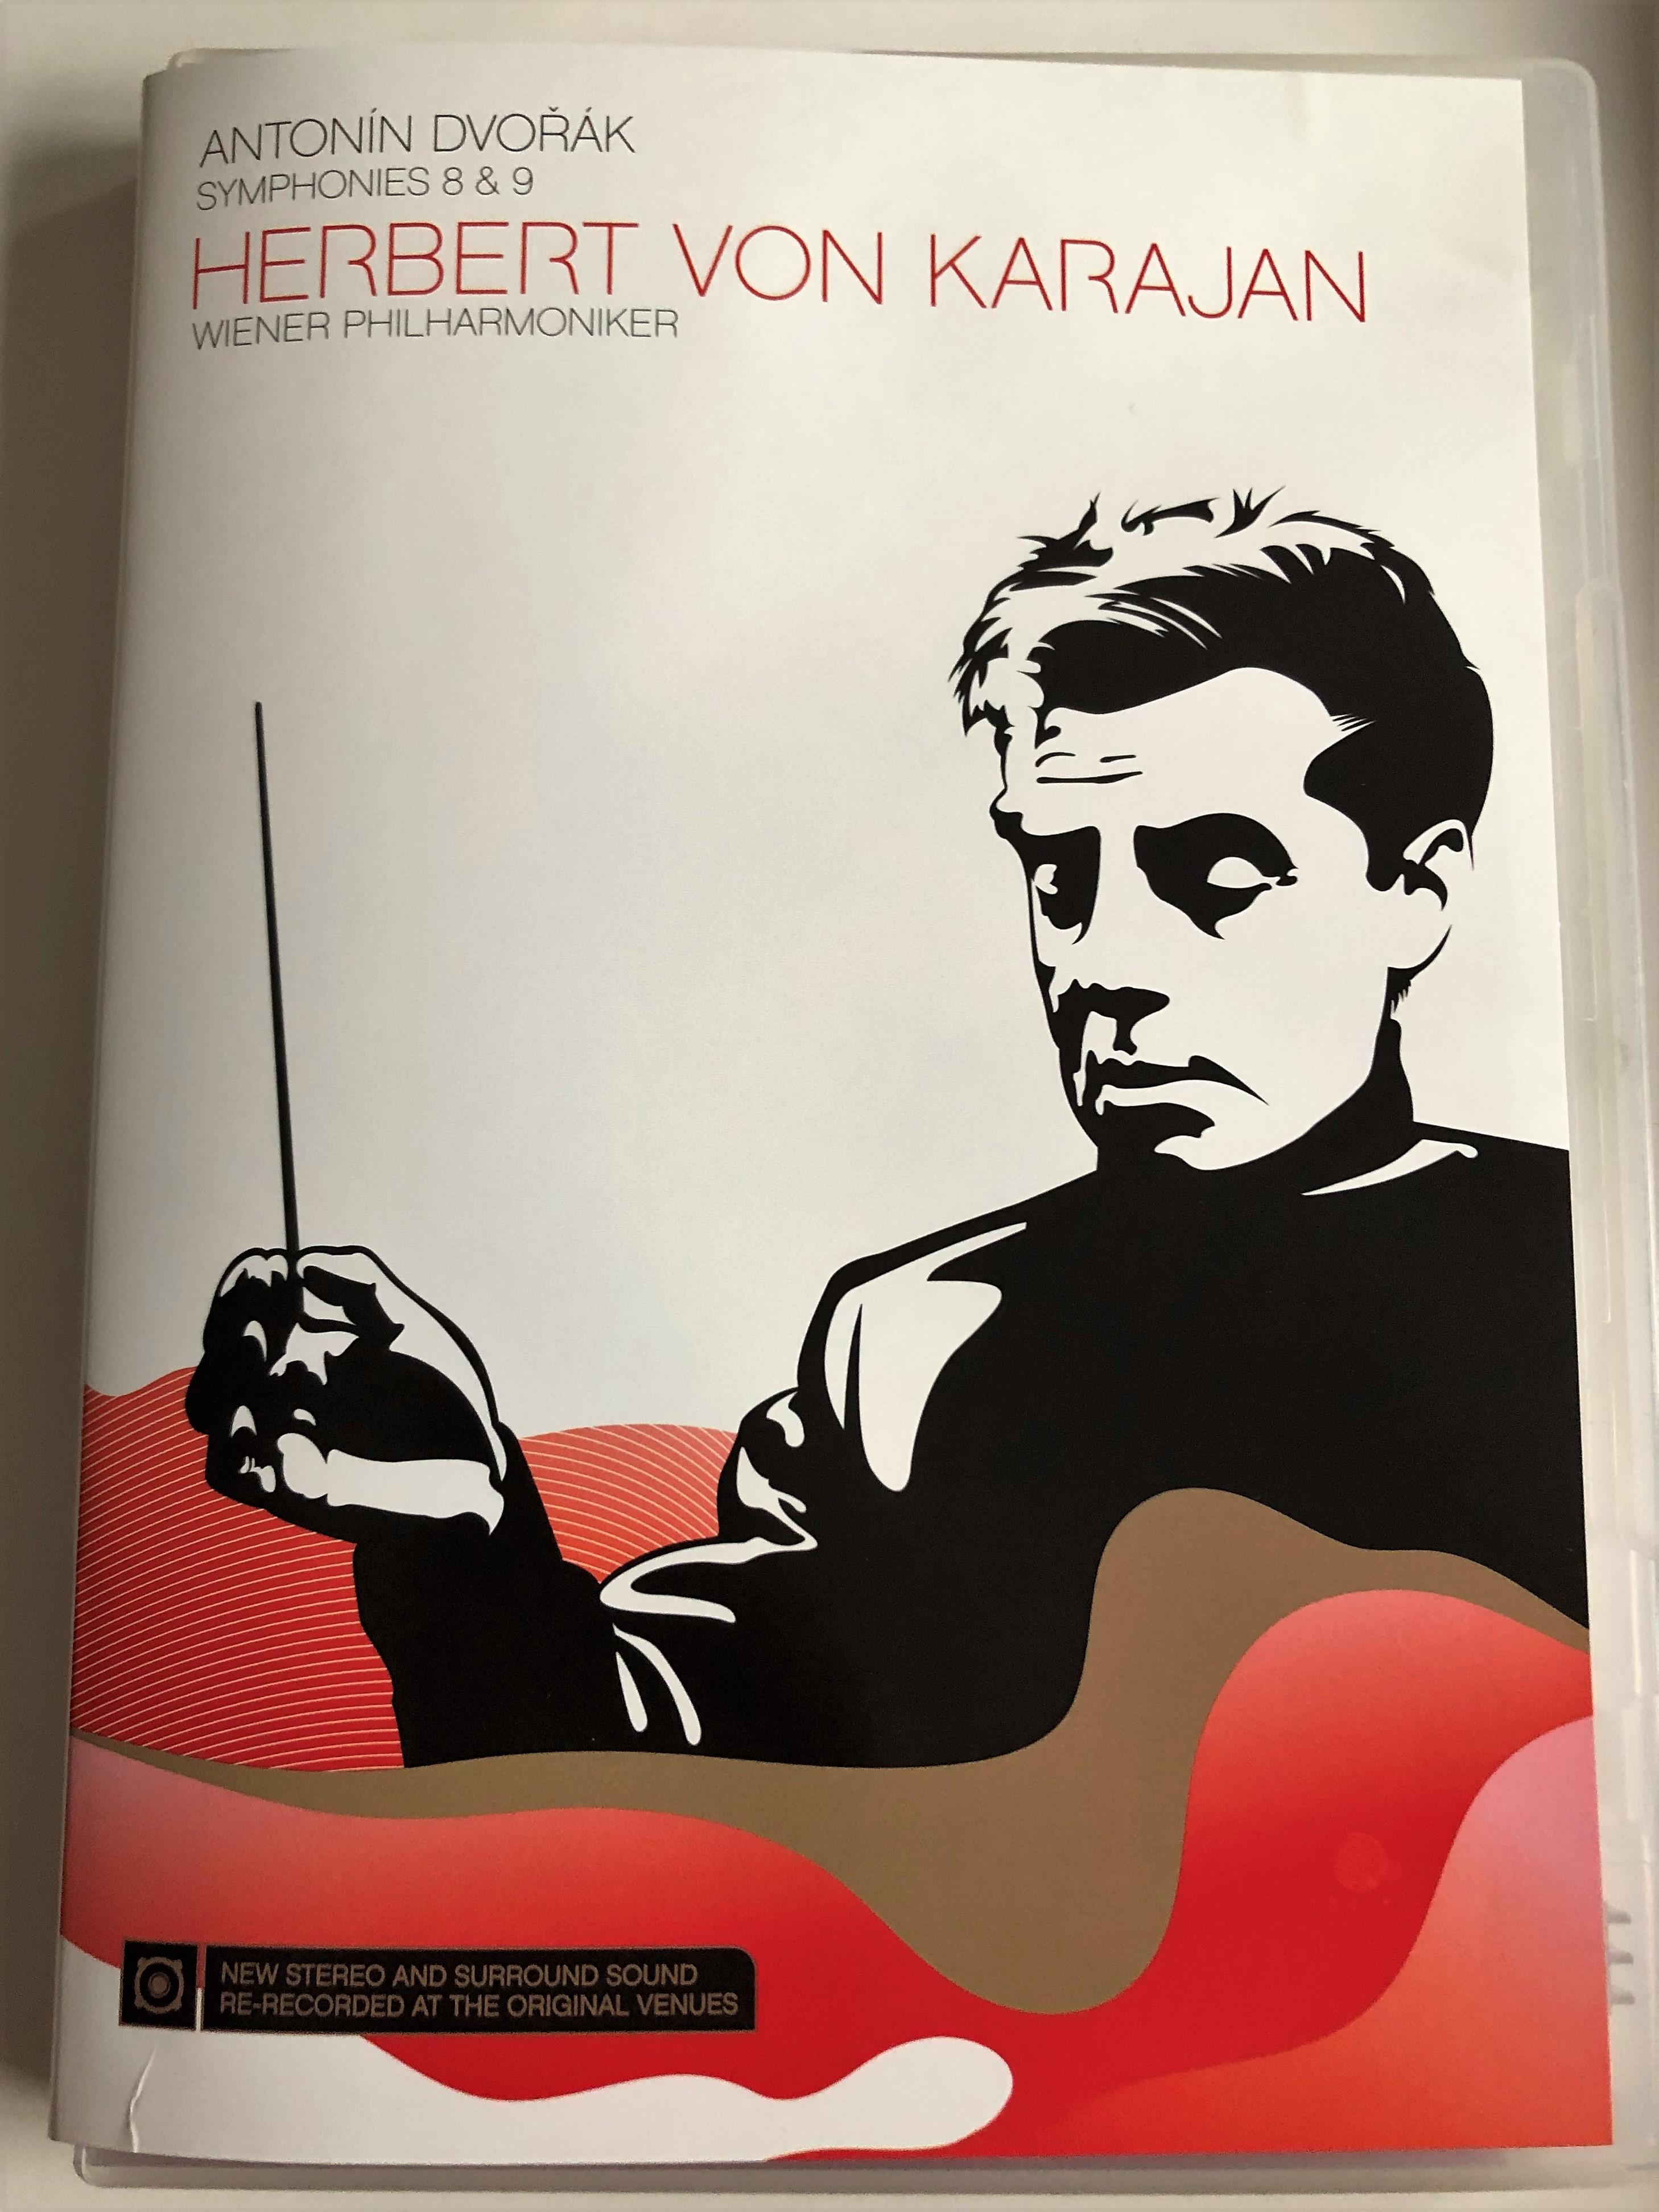 anton-n-dvo-k-symphonies-8-9-dvd-2014-herbert-von-karajan-wiener-philharmoniker-new-stereo-and-surround-sound-sony-classical-1-.jpg